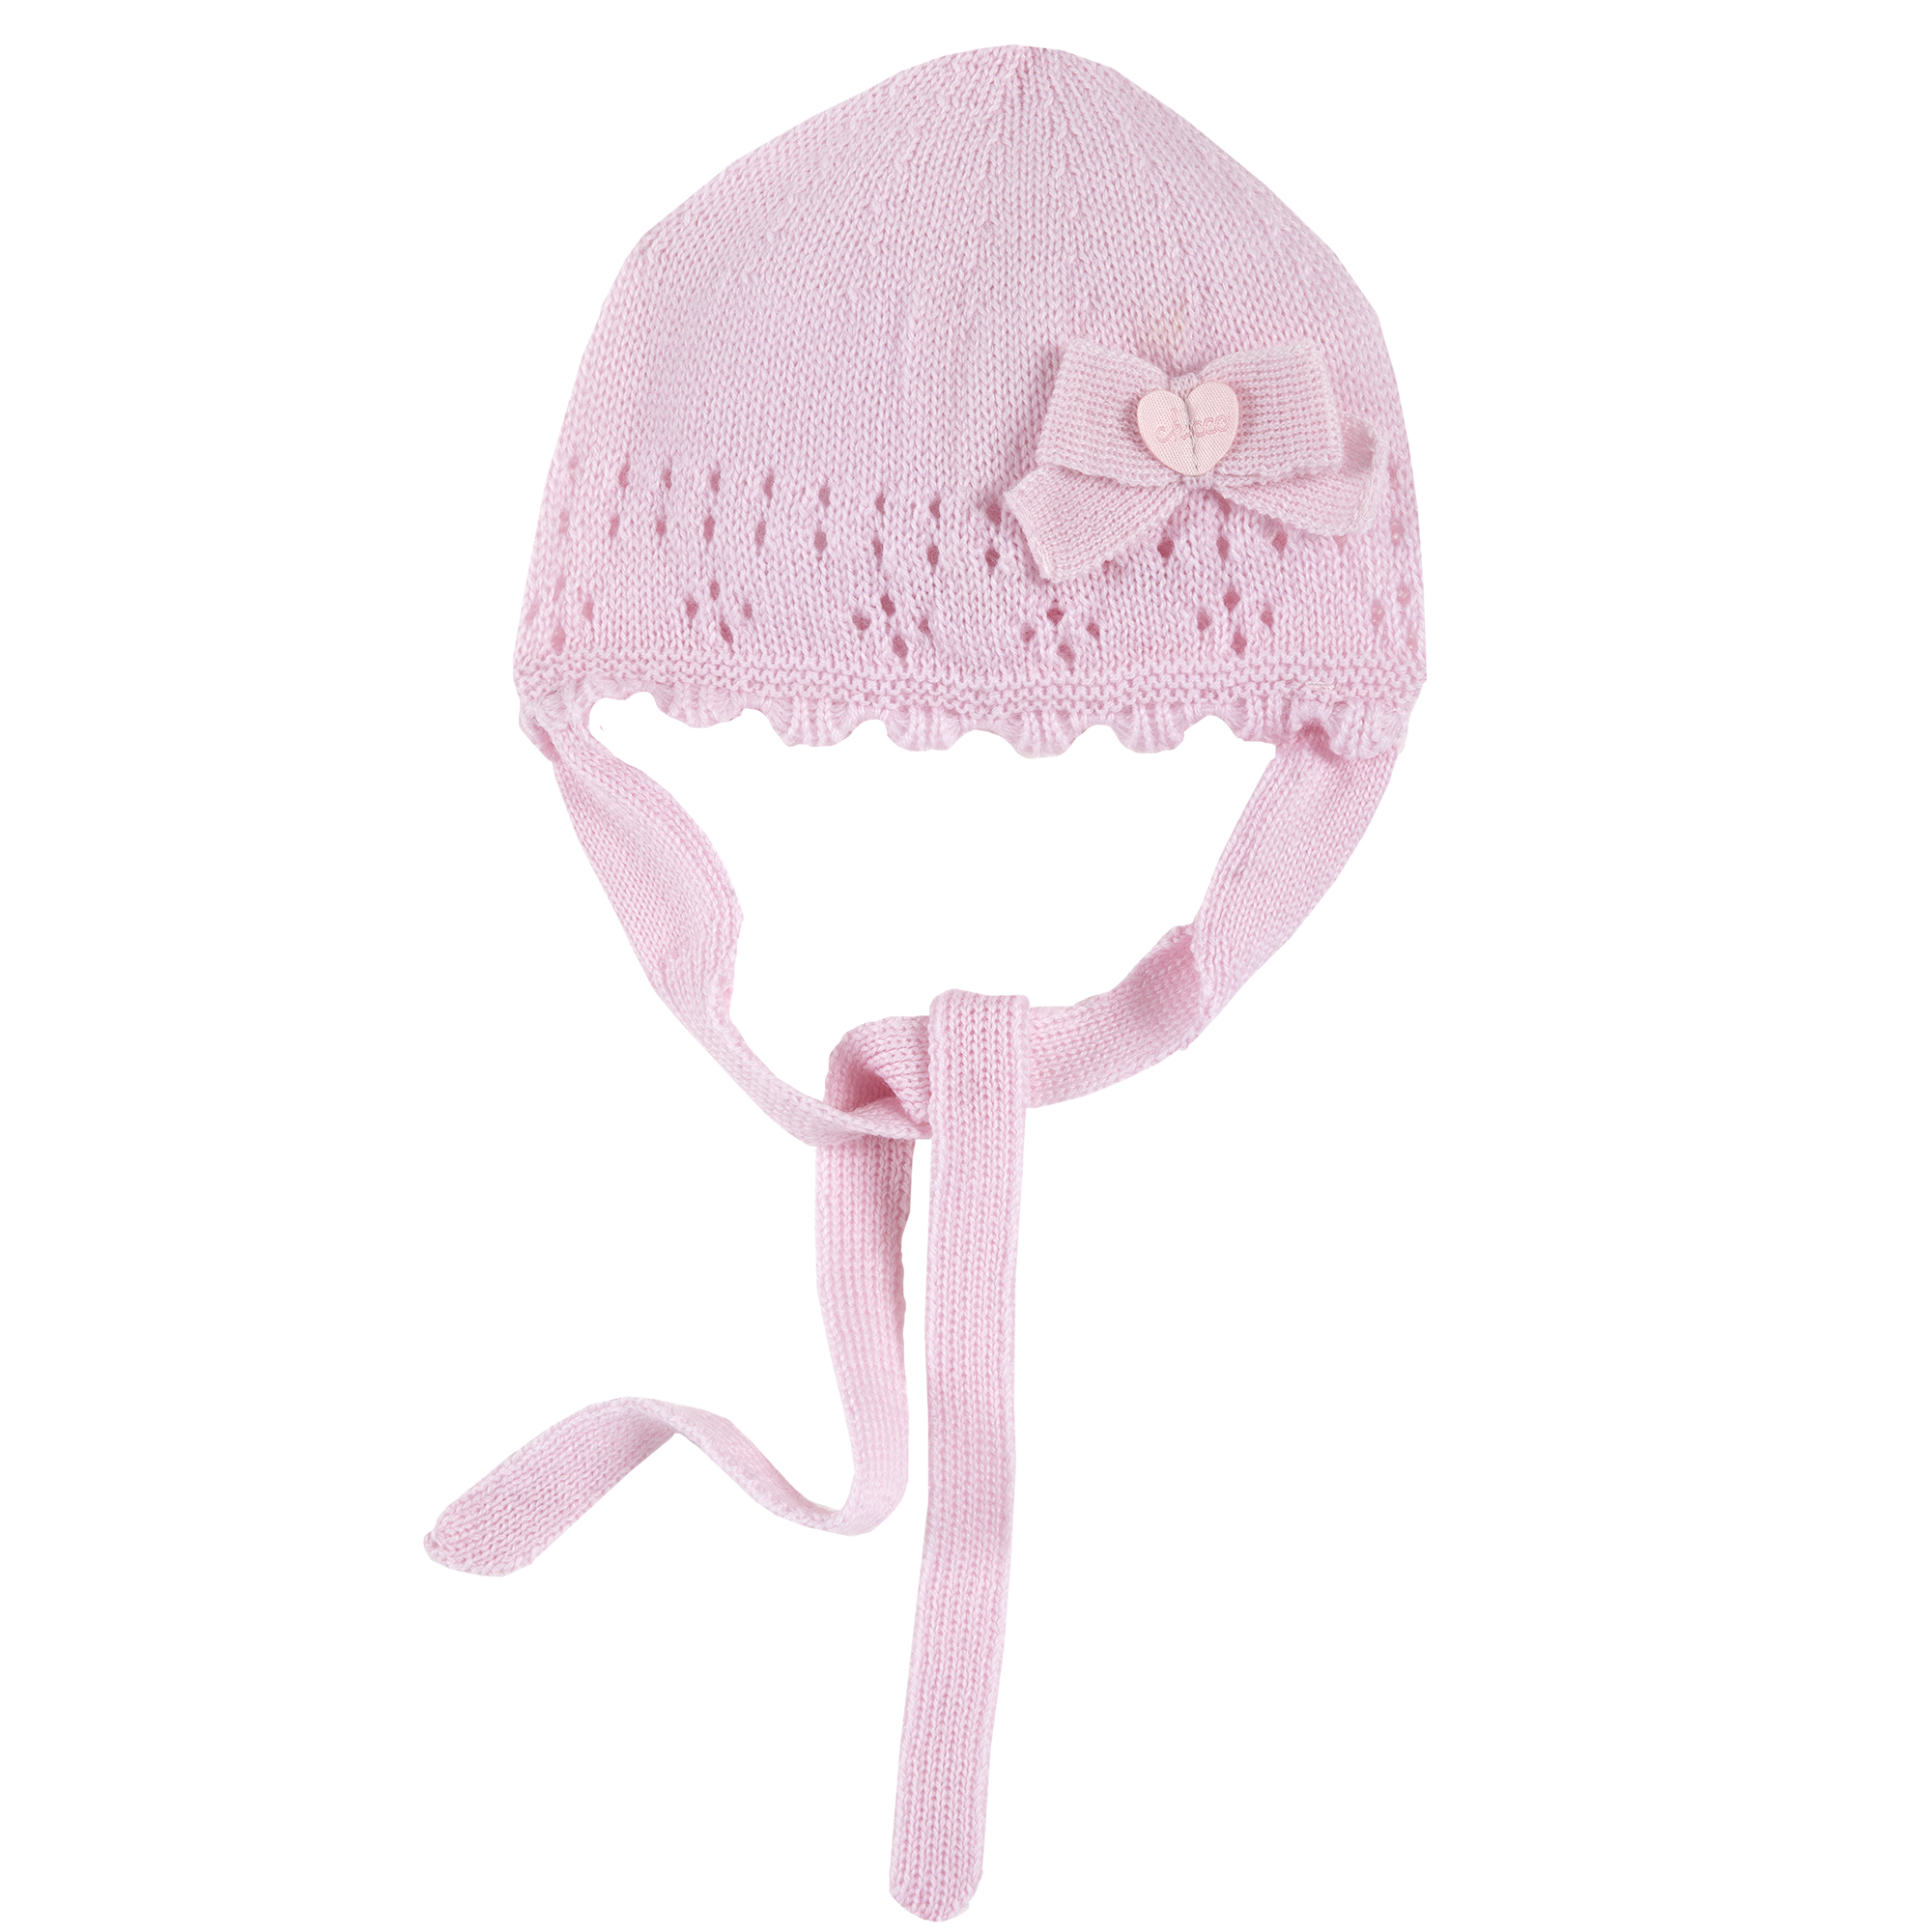 Caciula copii Chicco, tricotata, roz, 04491